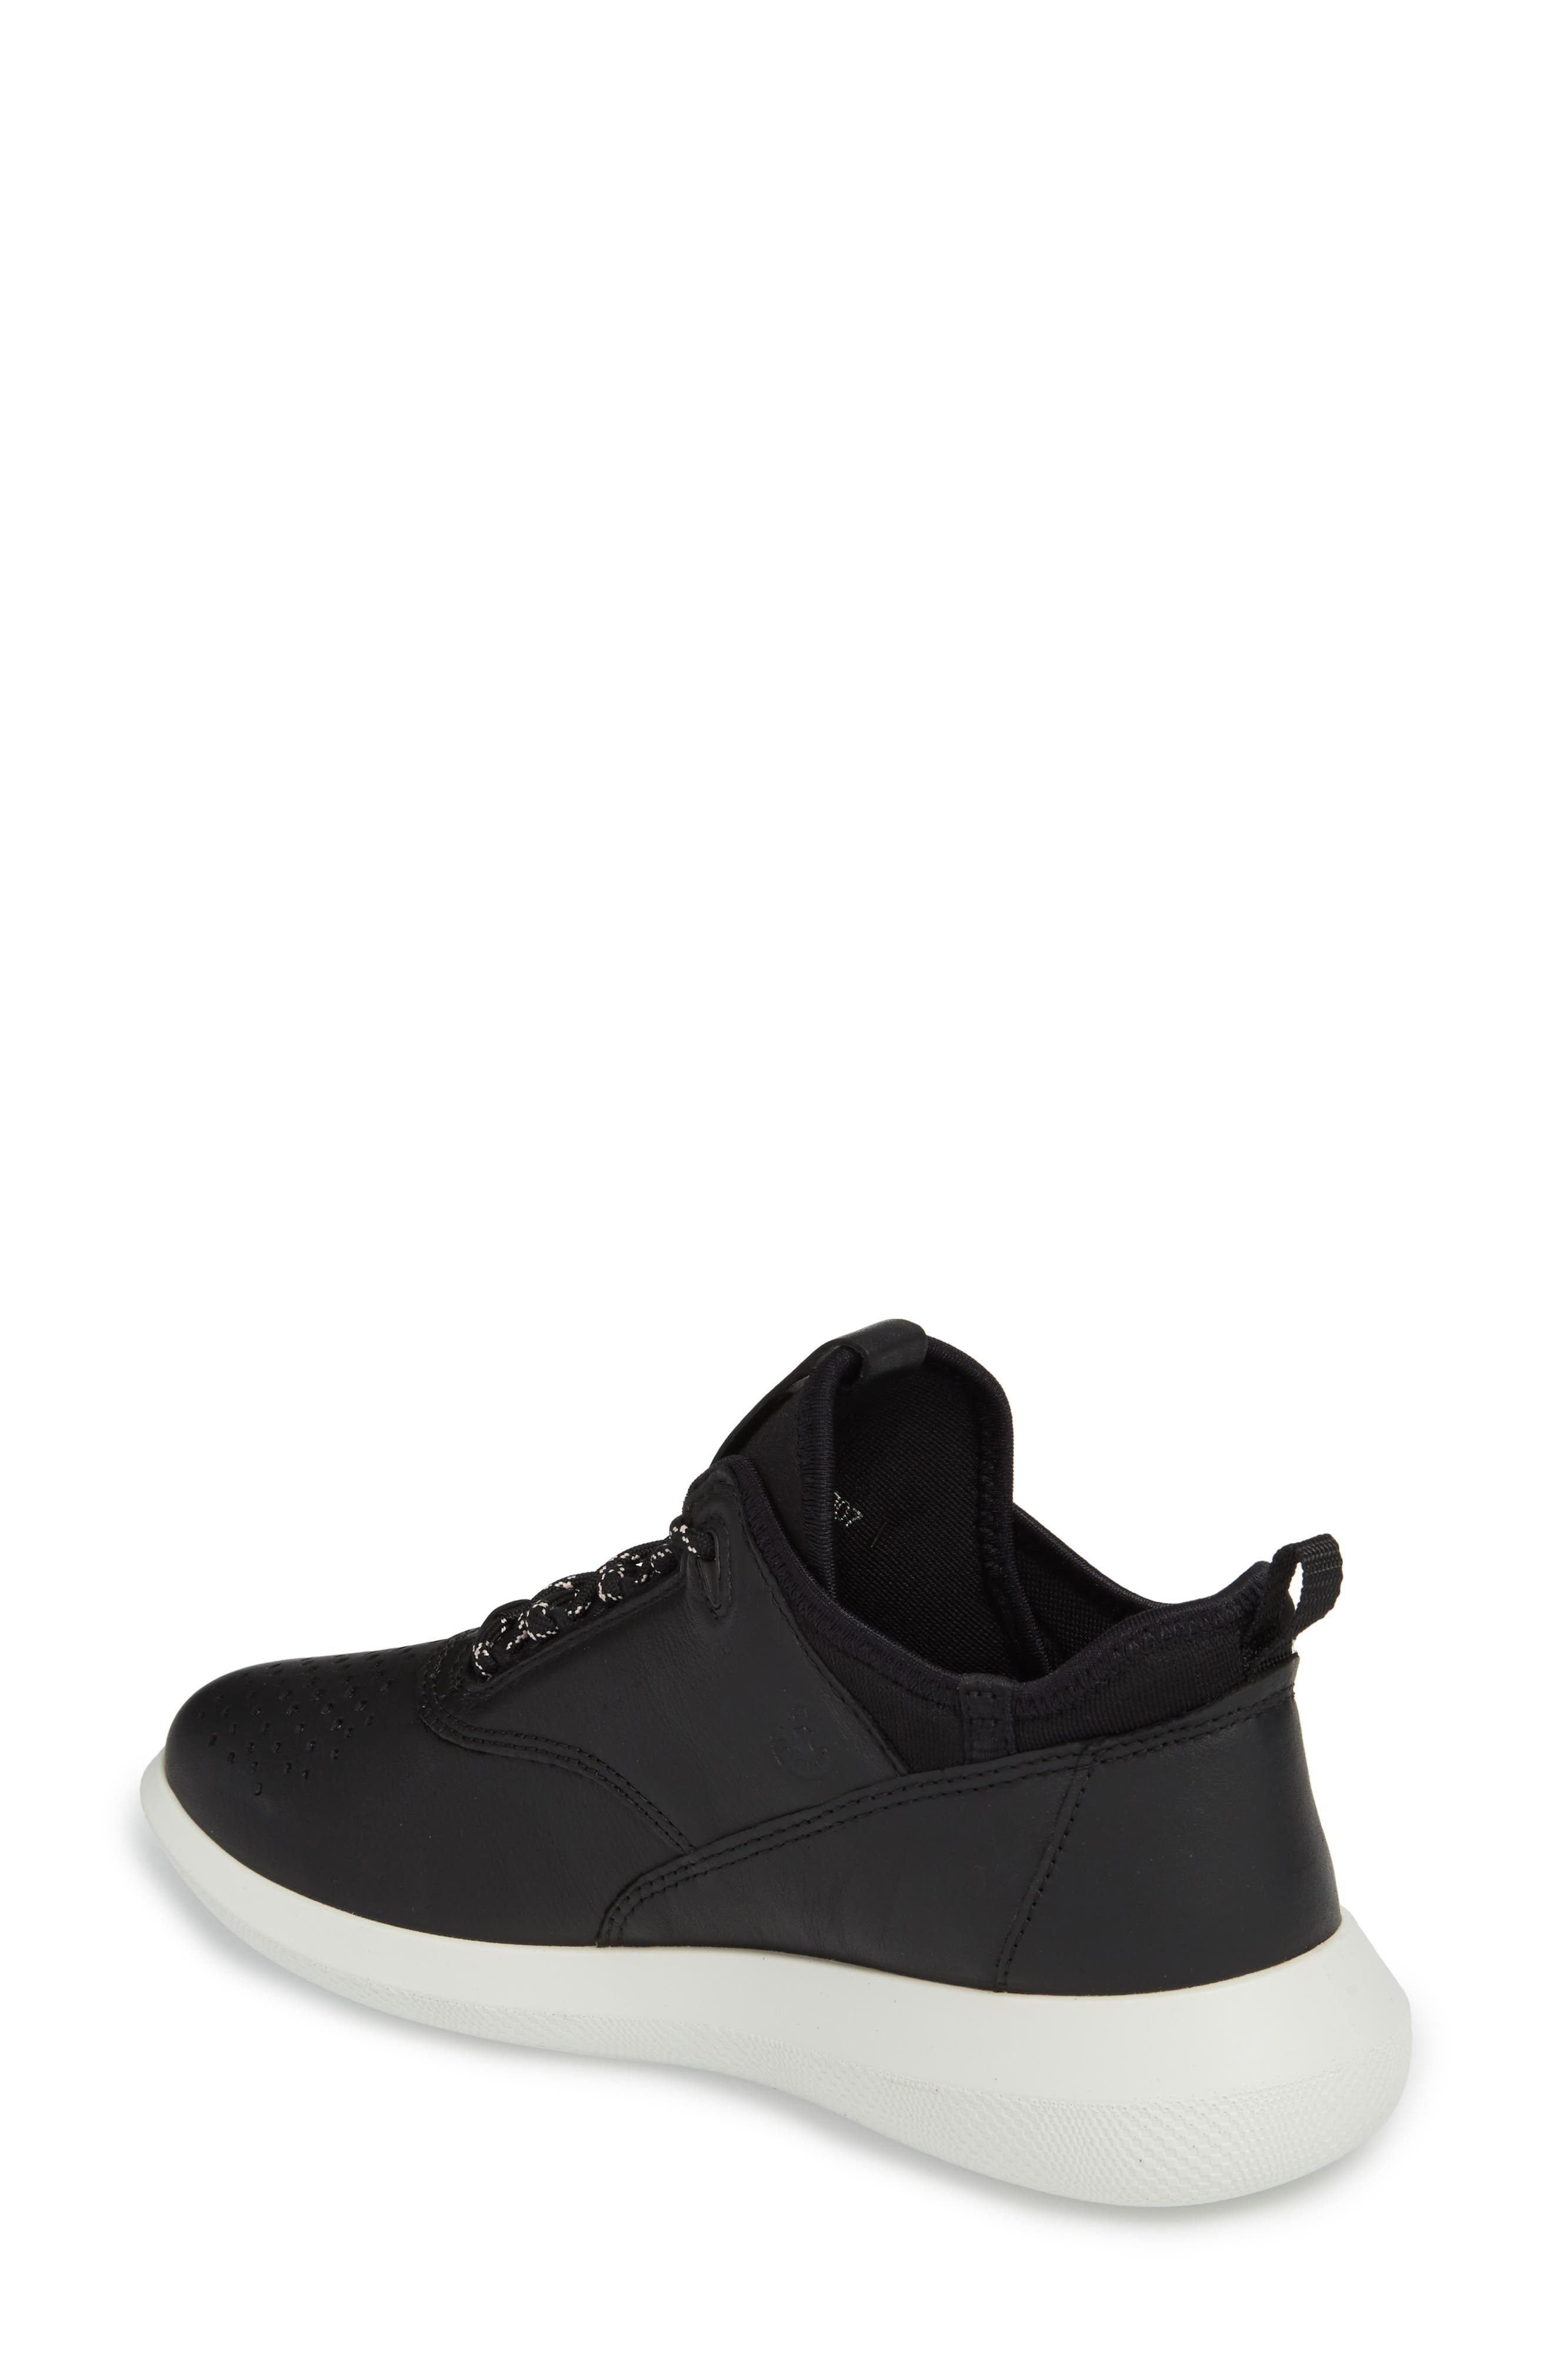 Scinapse Sneaker,                             Alternate thumbnail 2, color,                             BLACK LEATHER